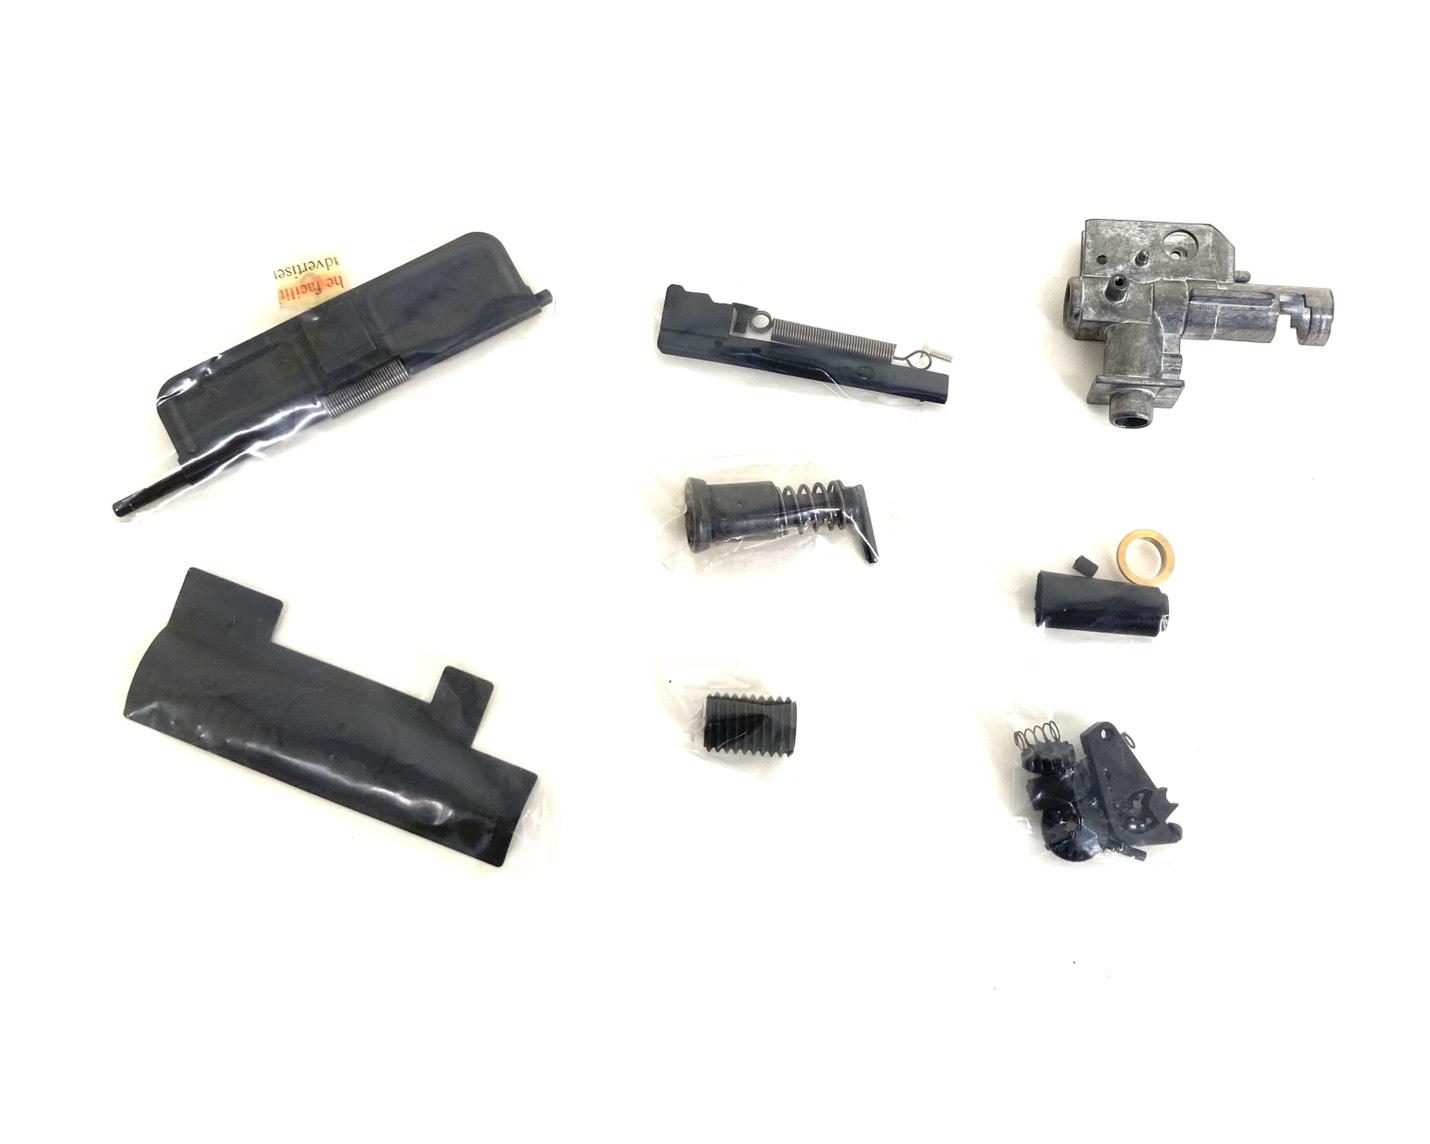 G&P GP-MEB020DE MOTS Taper Metal Receiver for Tokyo Marui M4 / M16 Series & G&P F.R.S